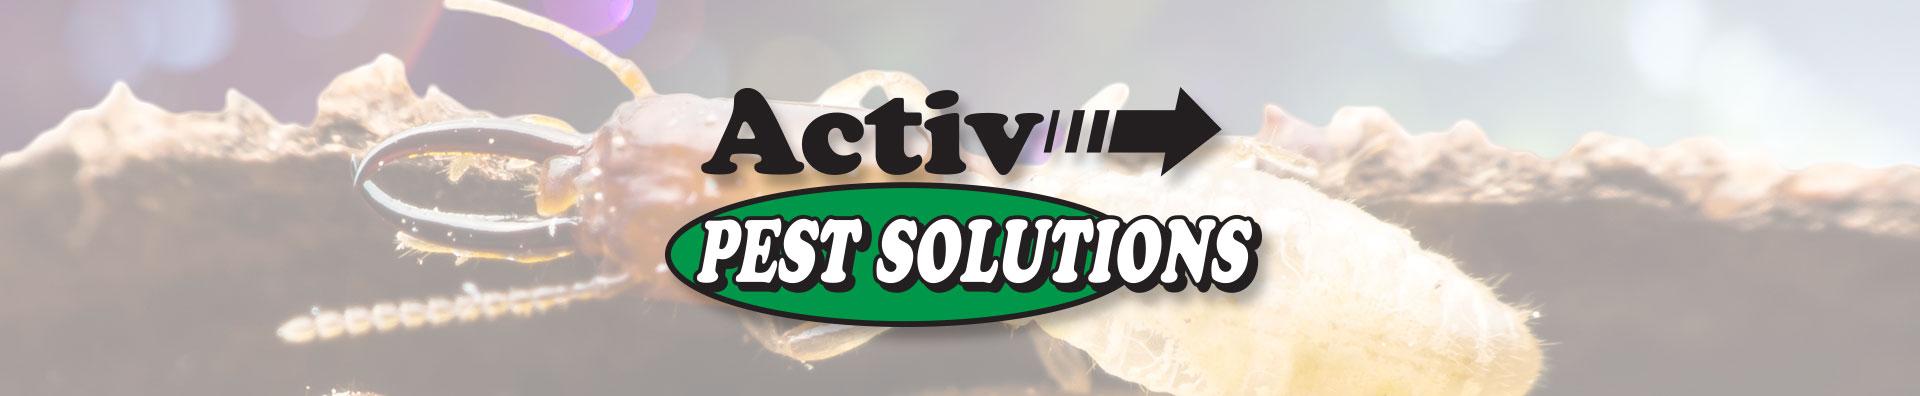 Activ Pest Solutions banner